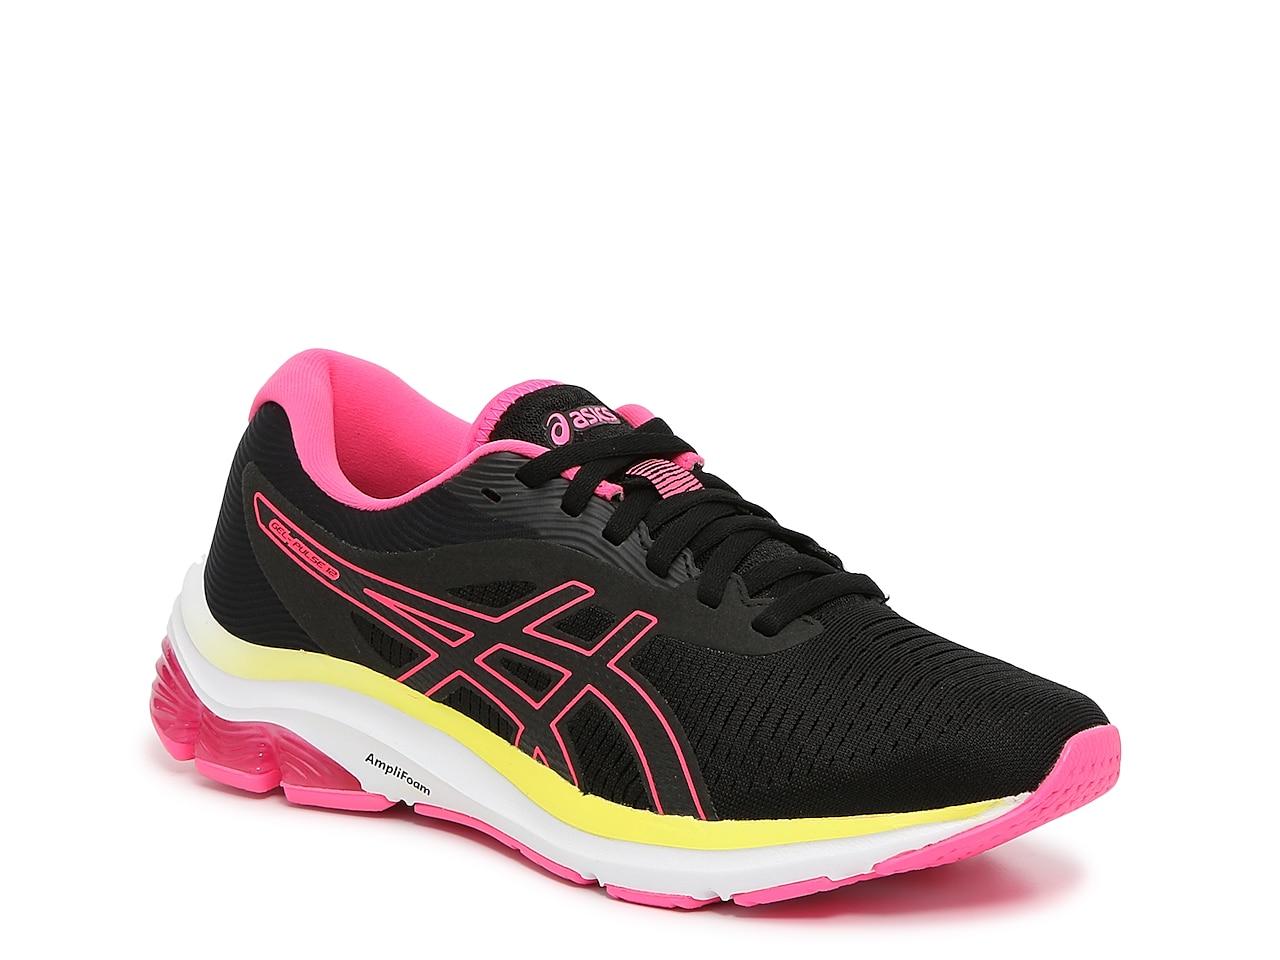 ASICS GEL-Pulse 12 Running Shoe - Women's